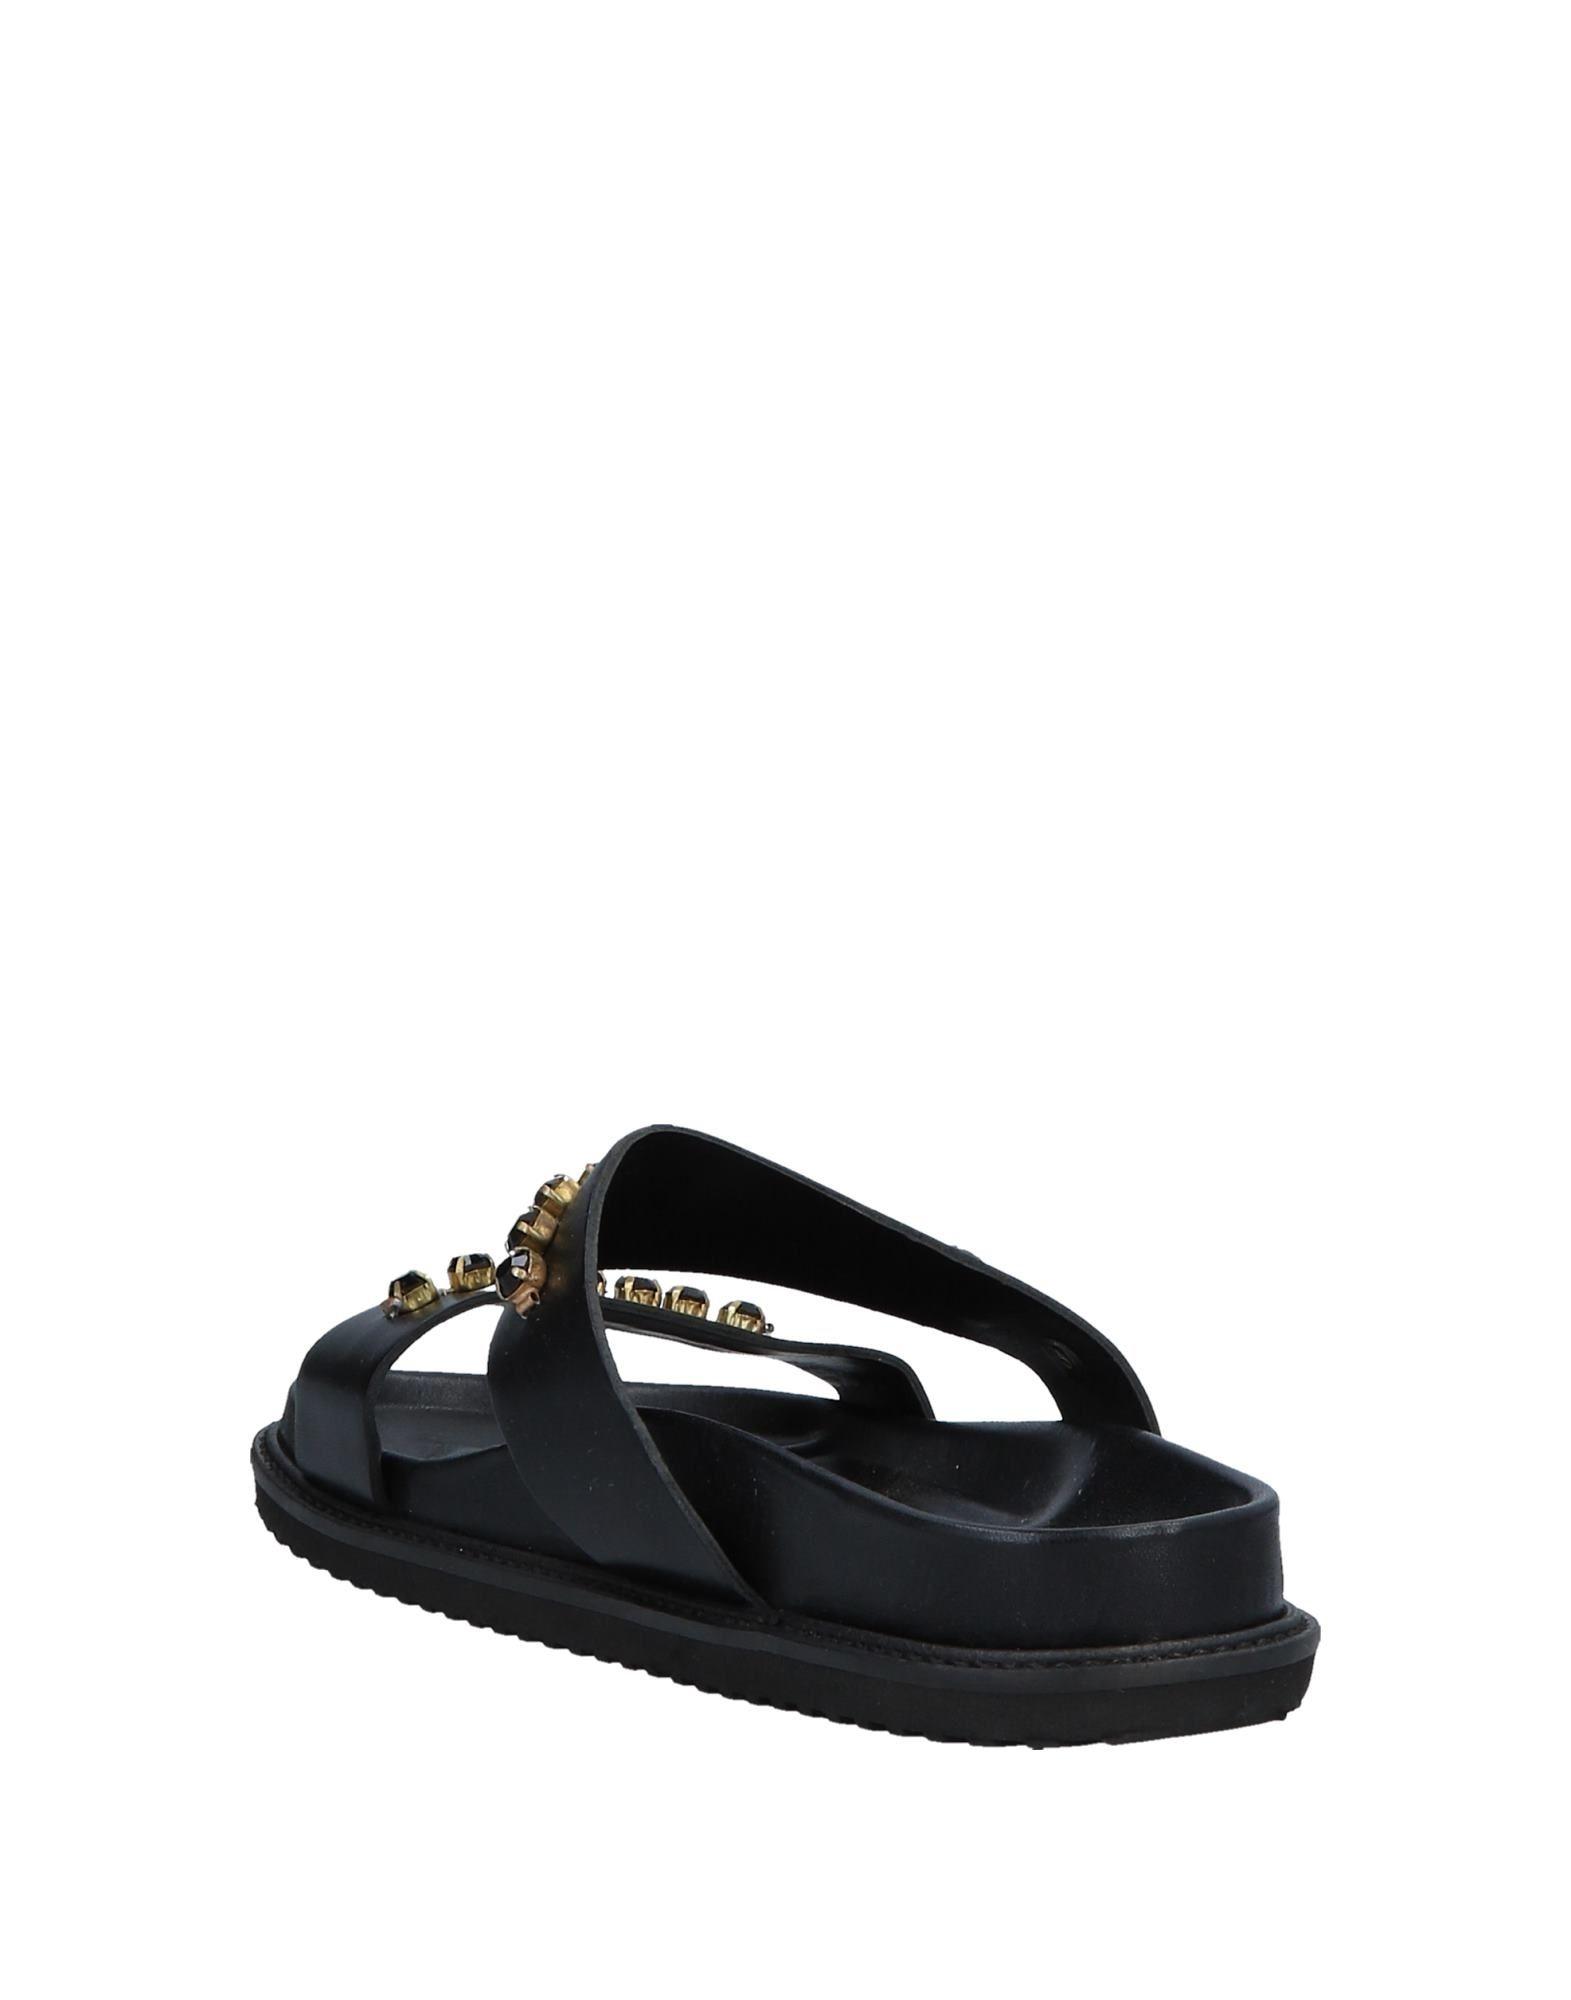 Twin-Set Simona Barbieri Sandals - - - Women Twin-Set Simona Barbieri Sandals online on  Canada - 11561152KT 78aadb